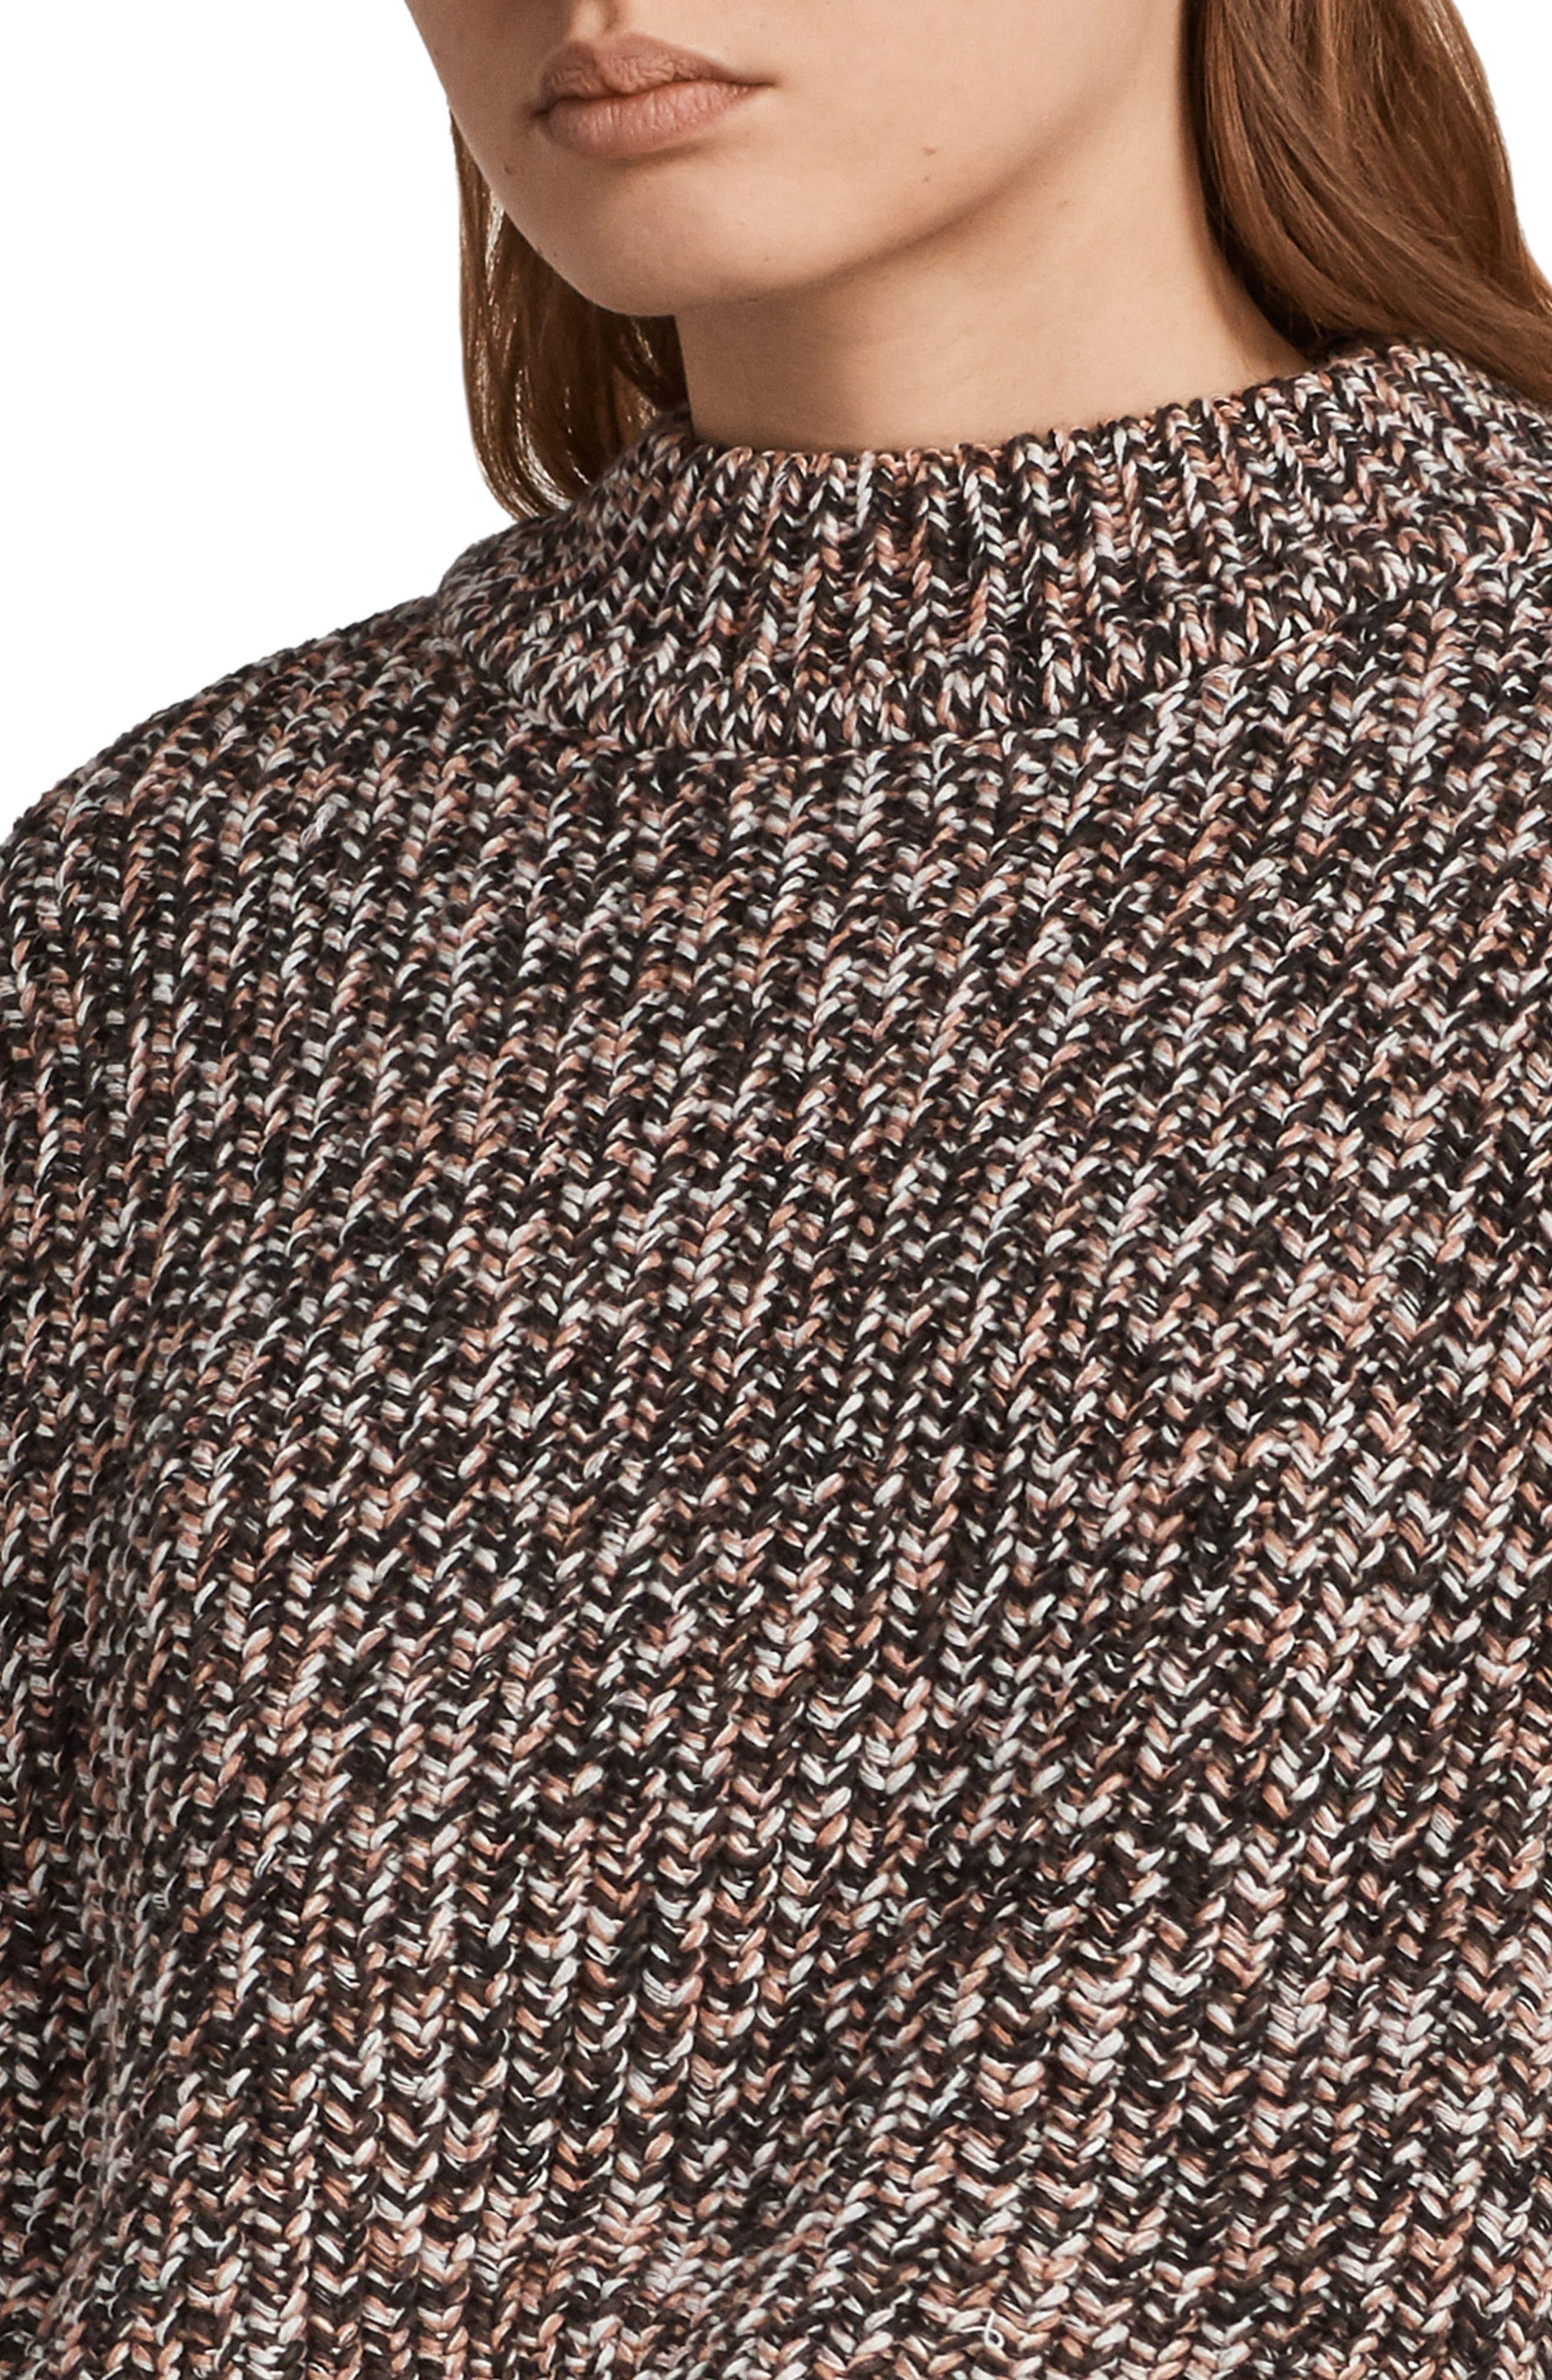 Malu Knit Sweater,                             Alternate thumbnail 4, color,                             Pink Mix